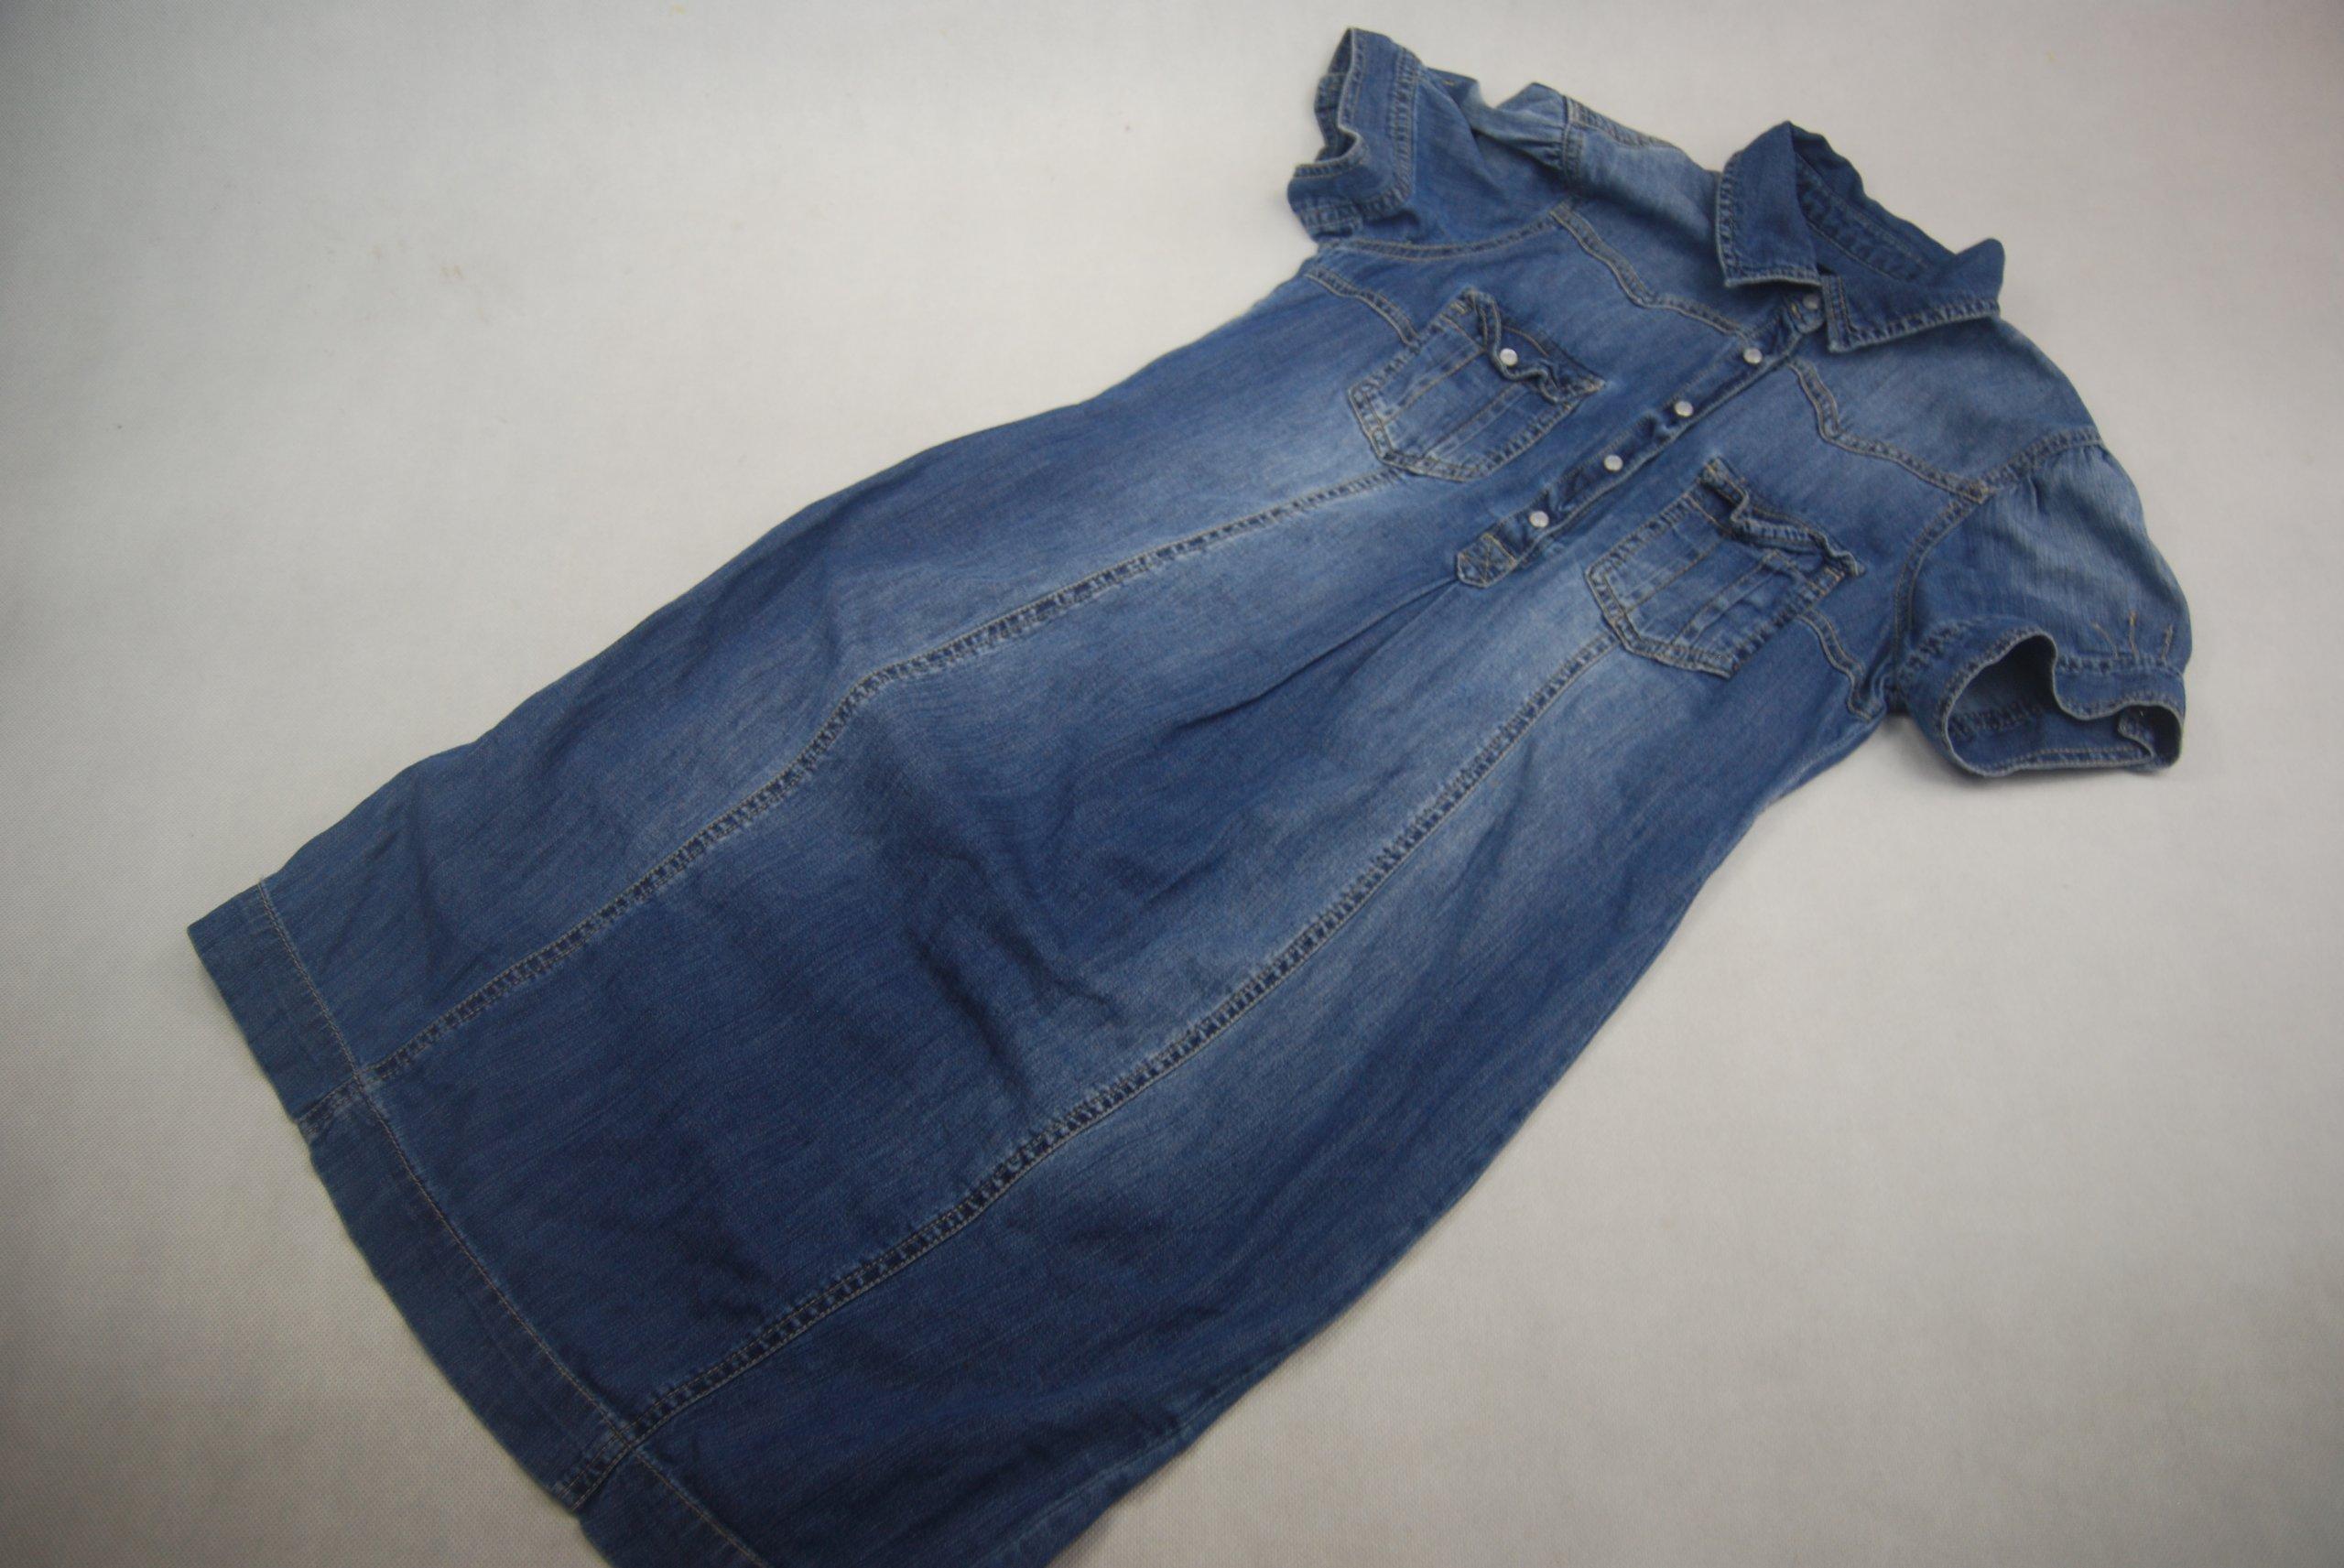 b8537489f1 H M Mama sukienka jeansowa ciążowa S - 7423621926 - oficjalne ...